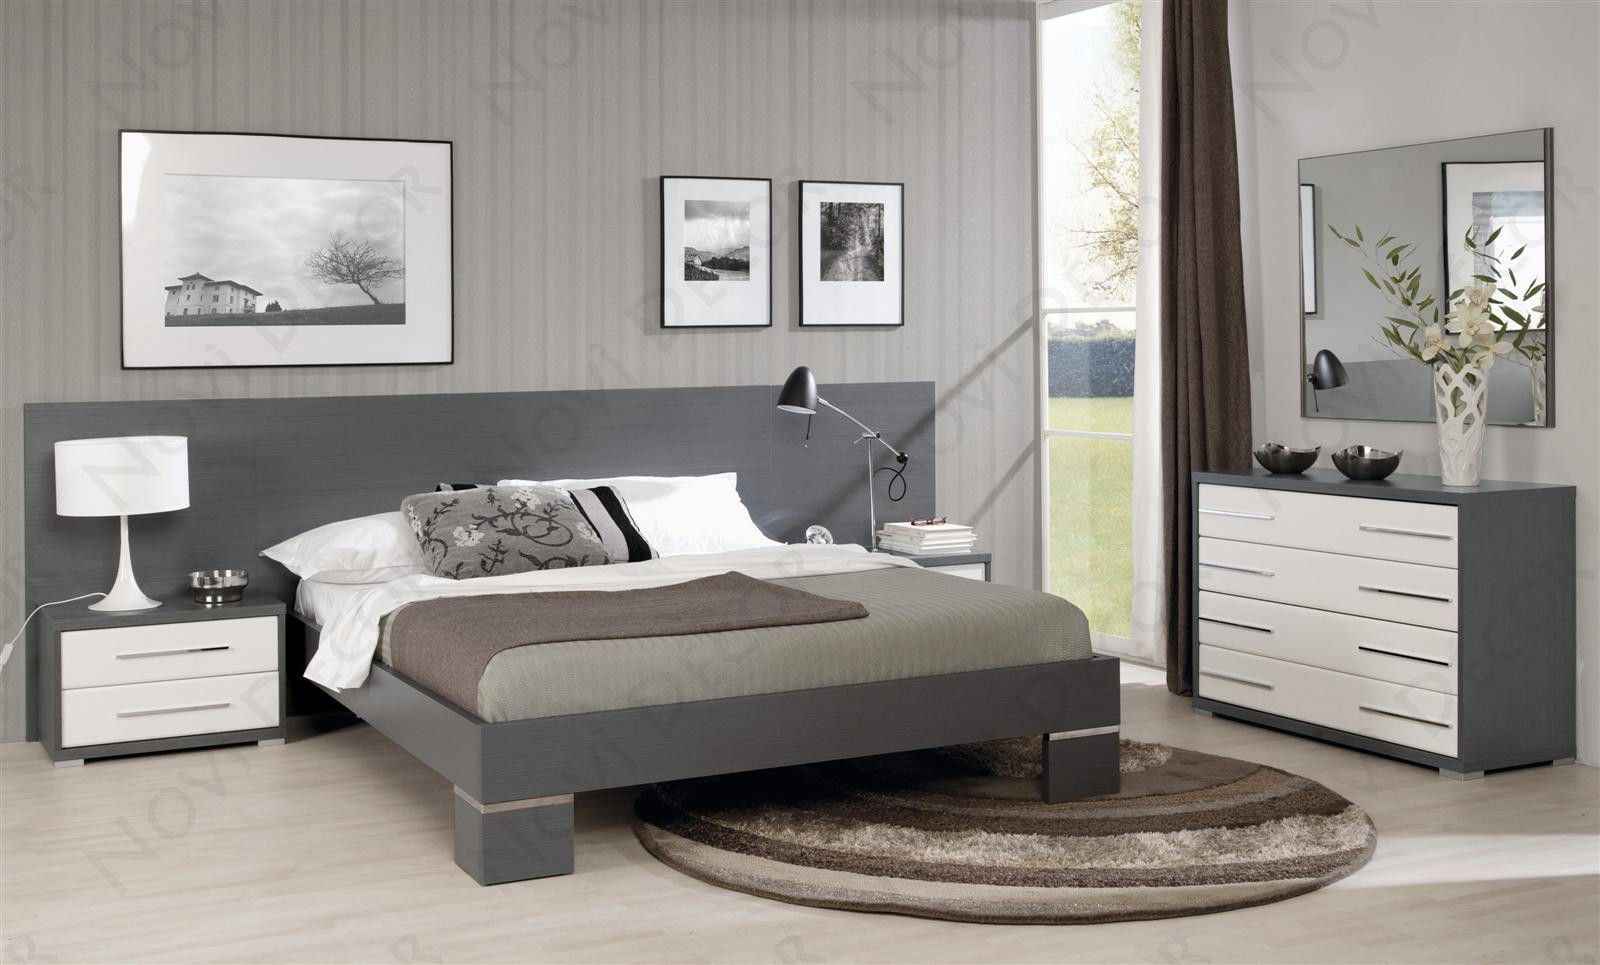 Grayness Grey Bedroom Furniture Sets Buy Bedroom Furniture White And Grey Bedroom Furniture